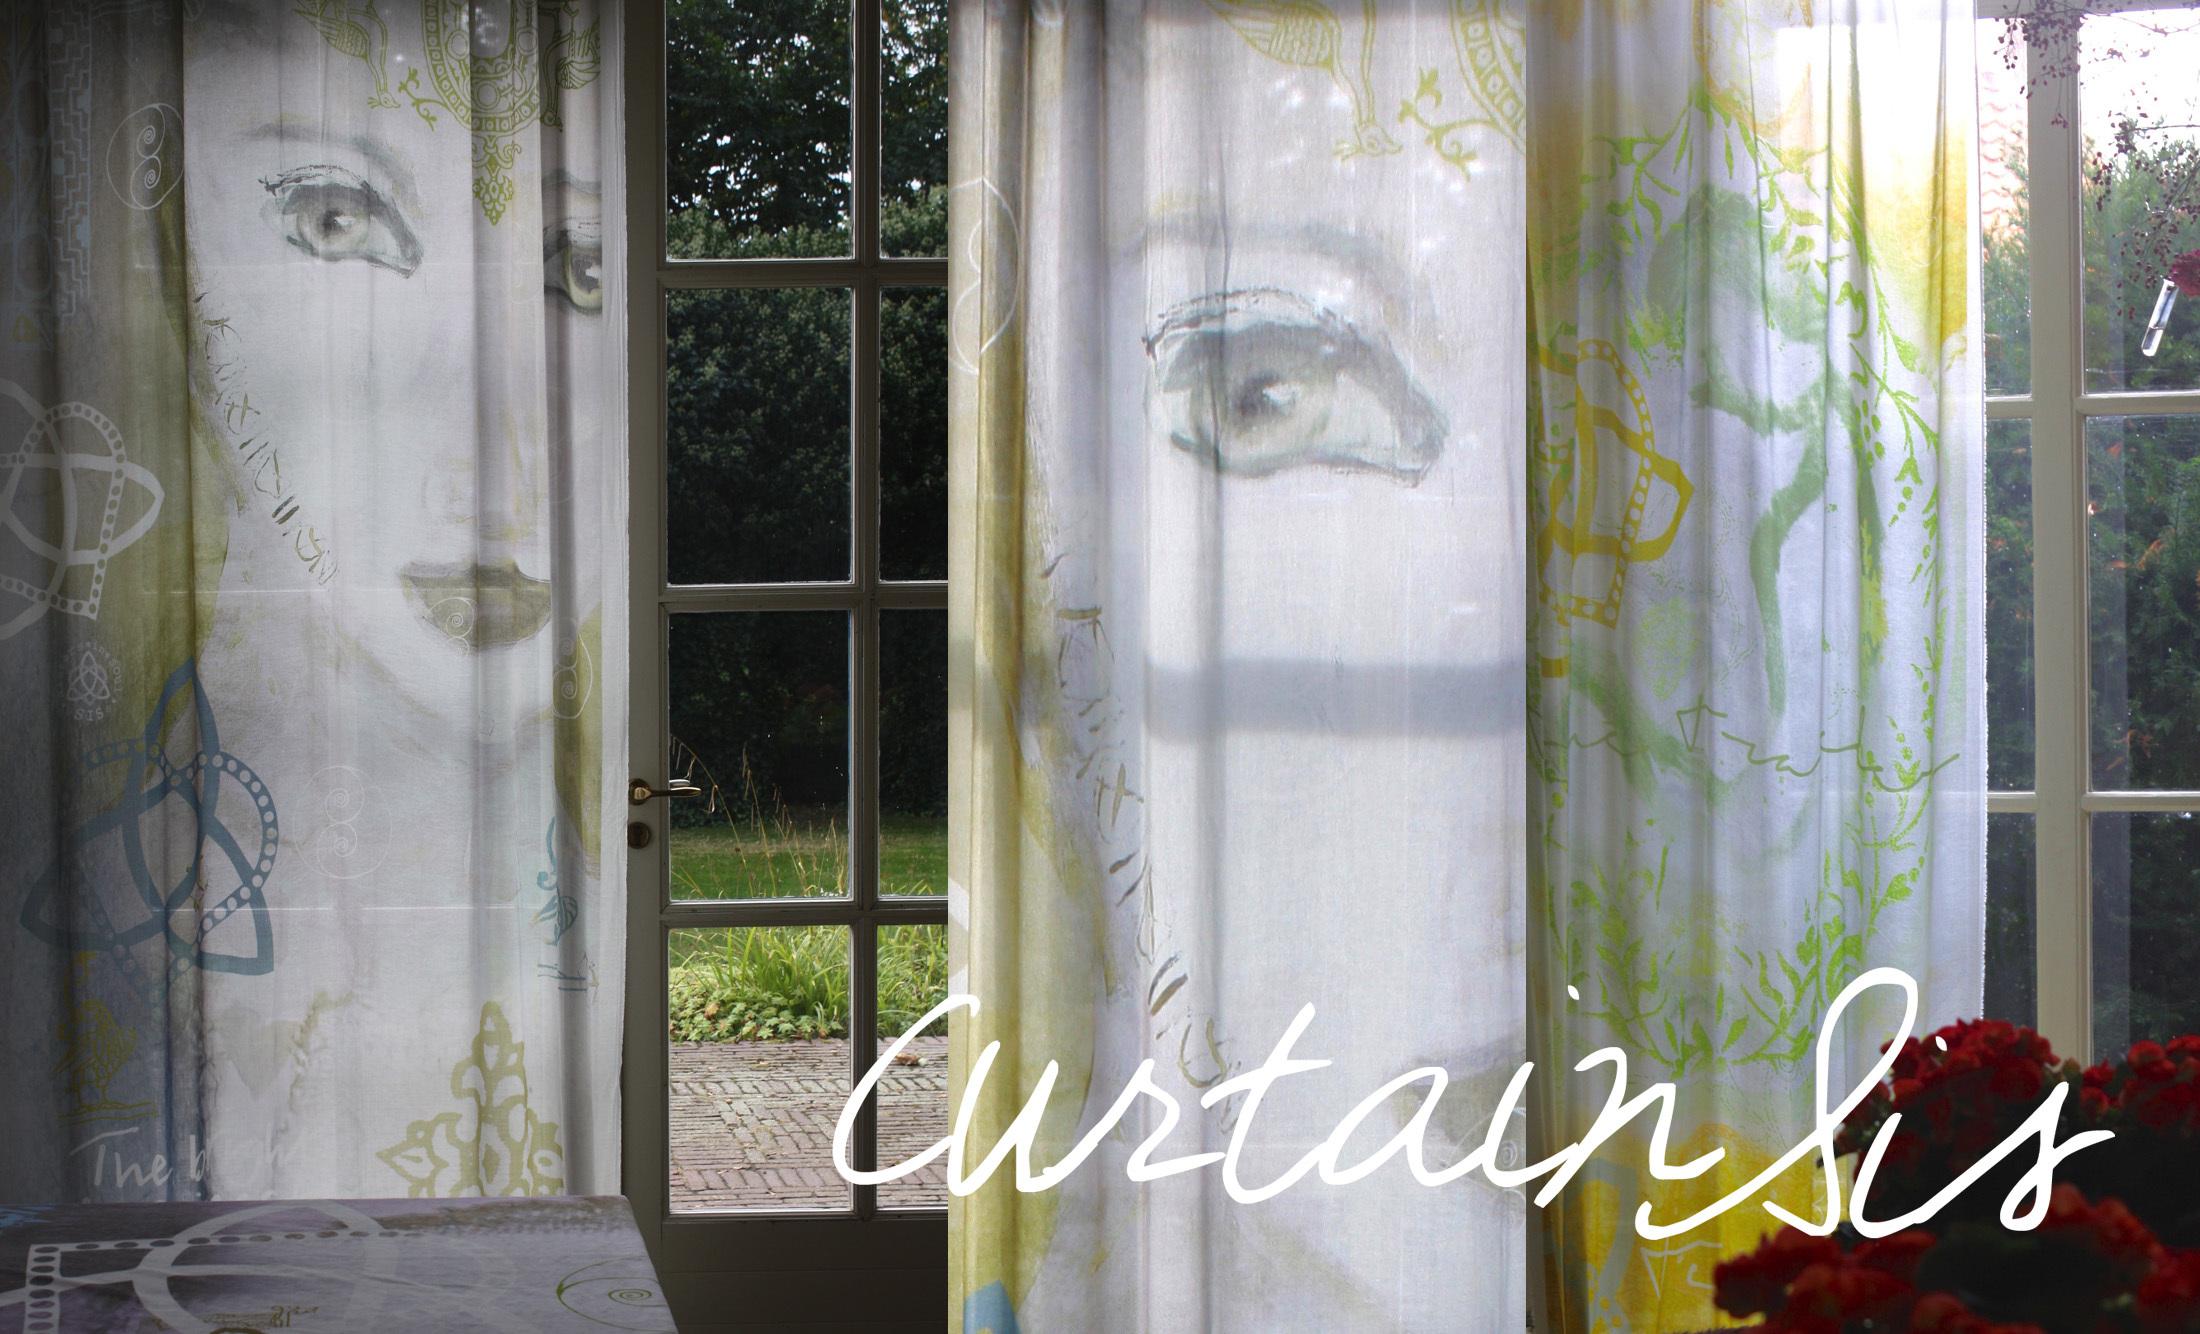 CurtainSis